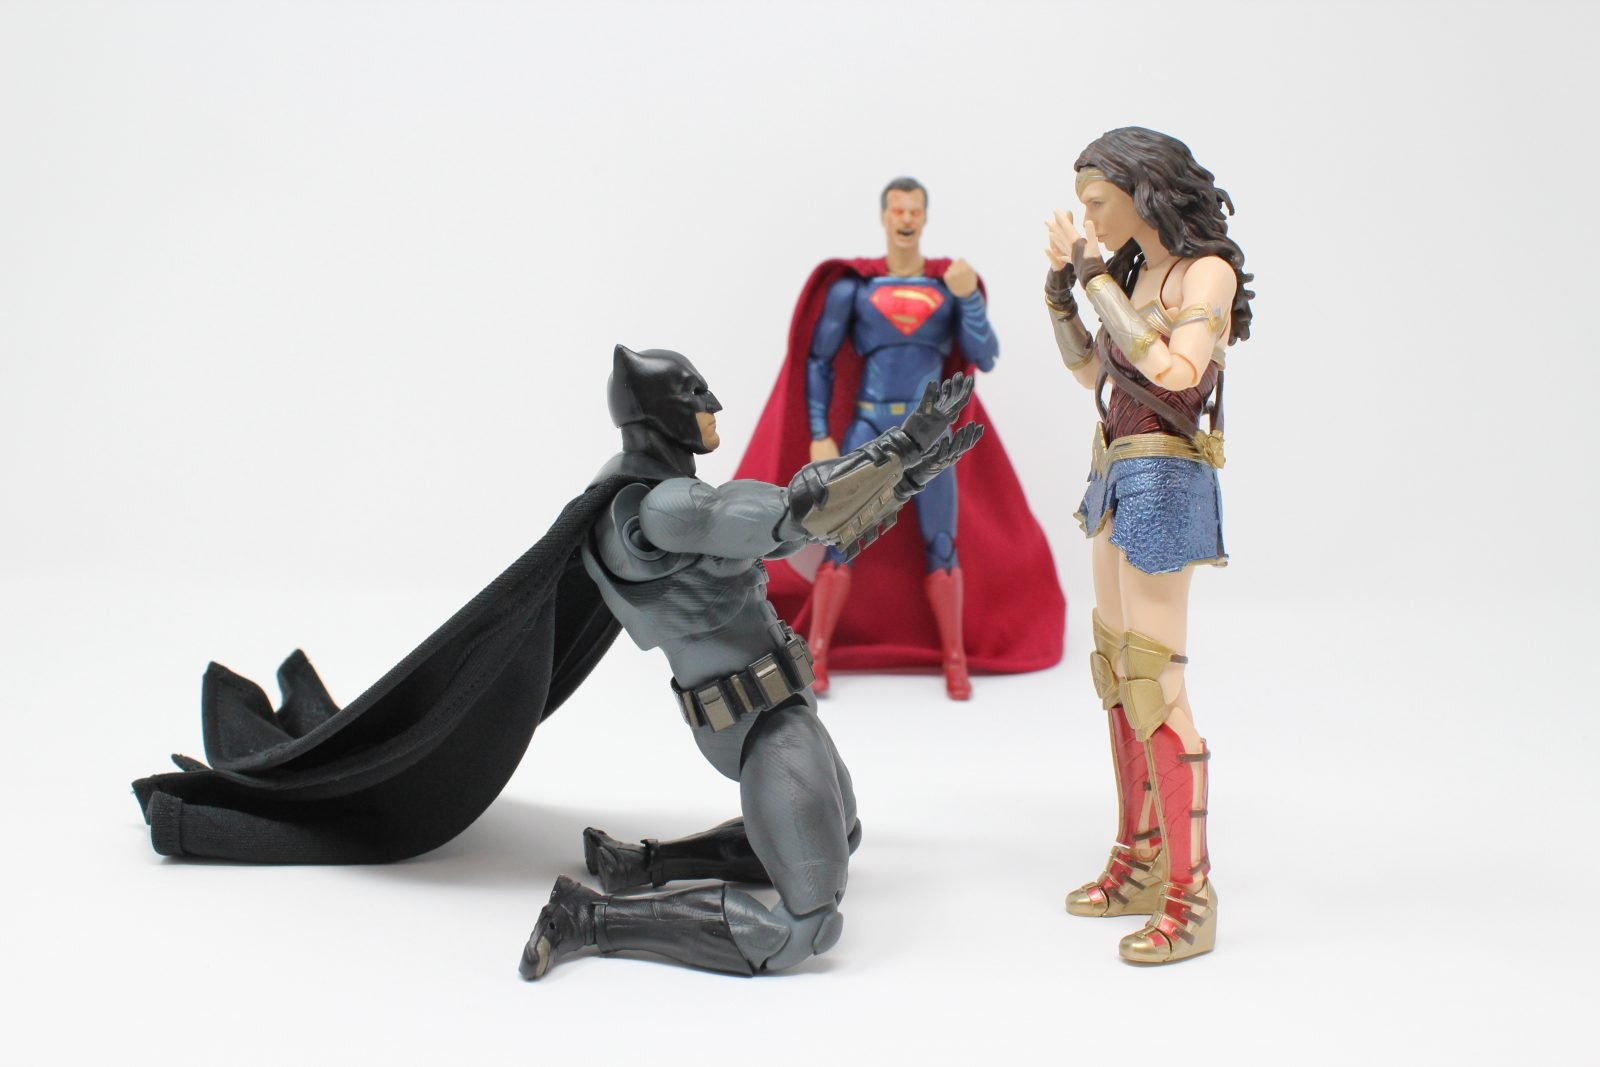 Superman, Batman, and Wonder Woman action figures